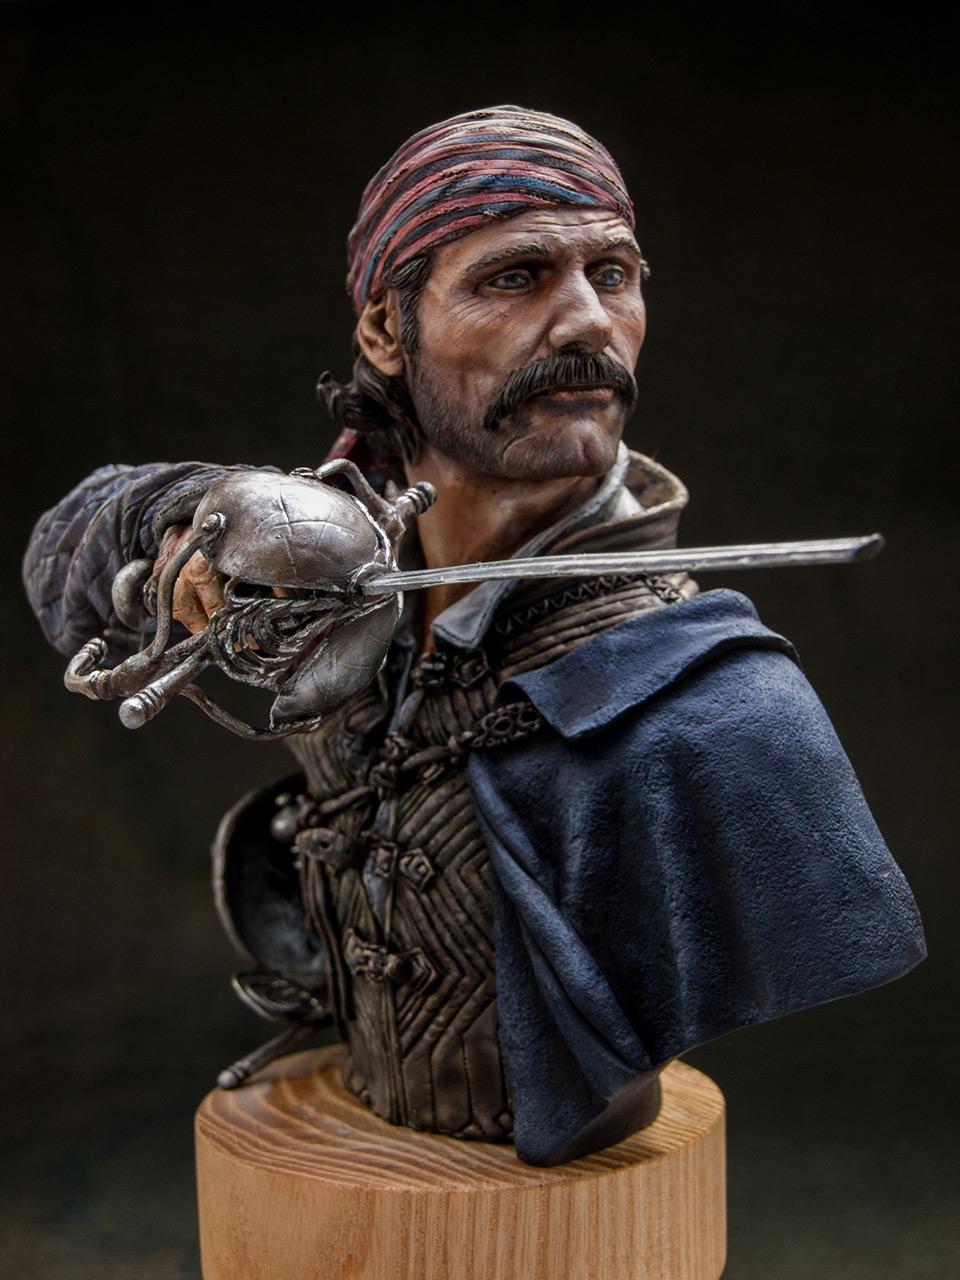 Figures: Diego Alatriste, photo #5